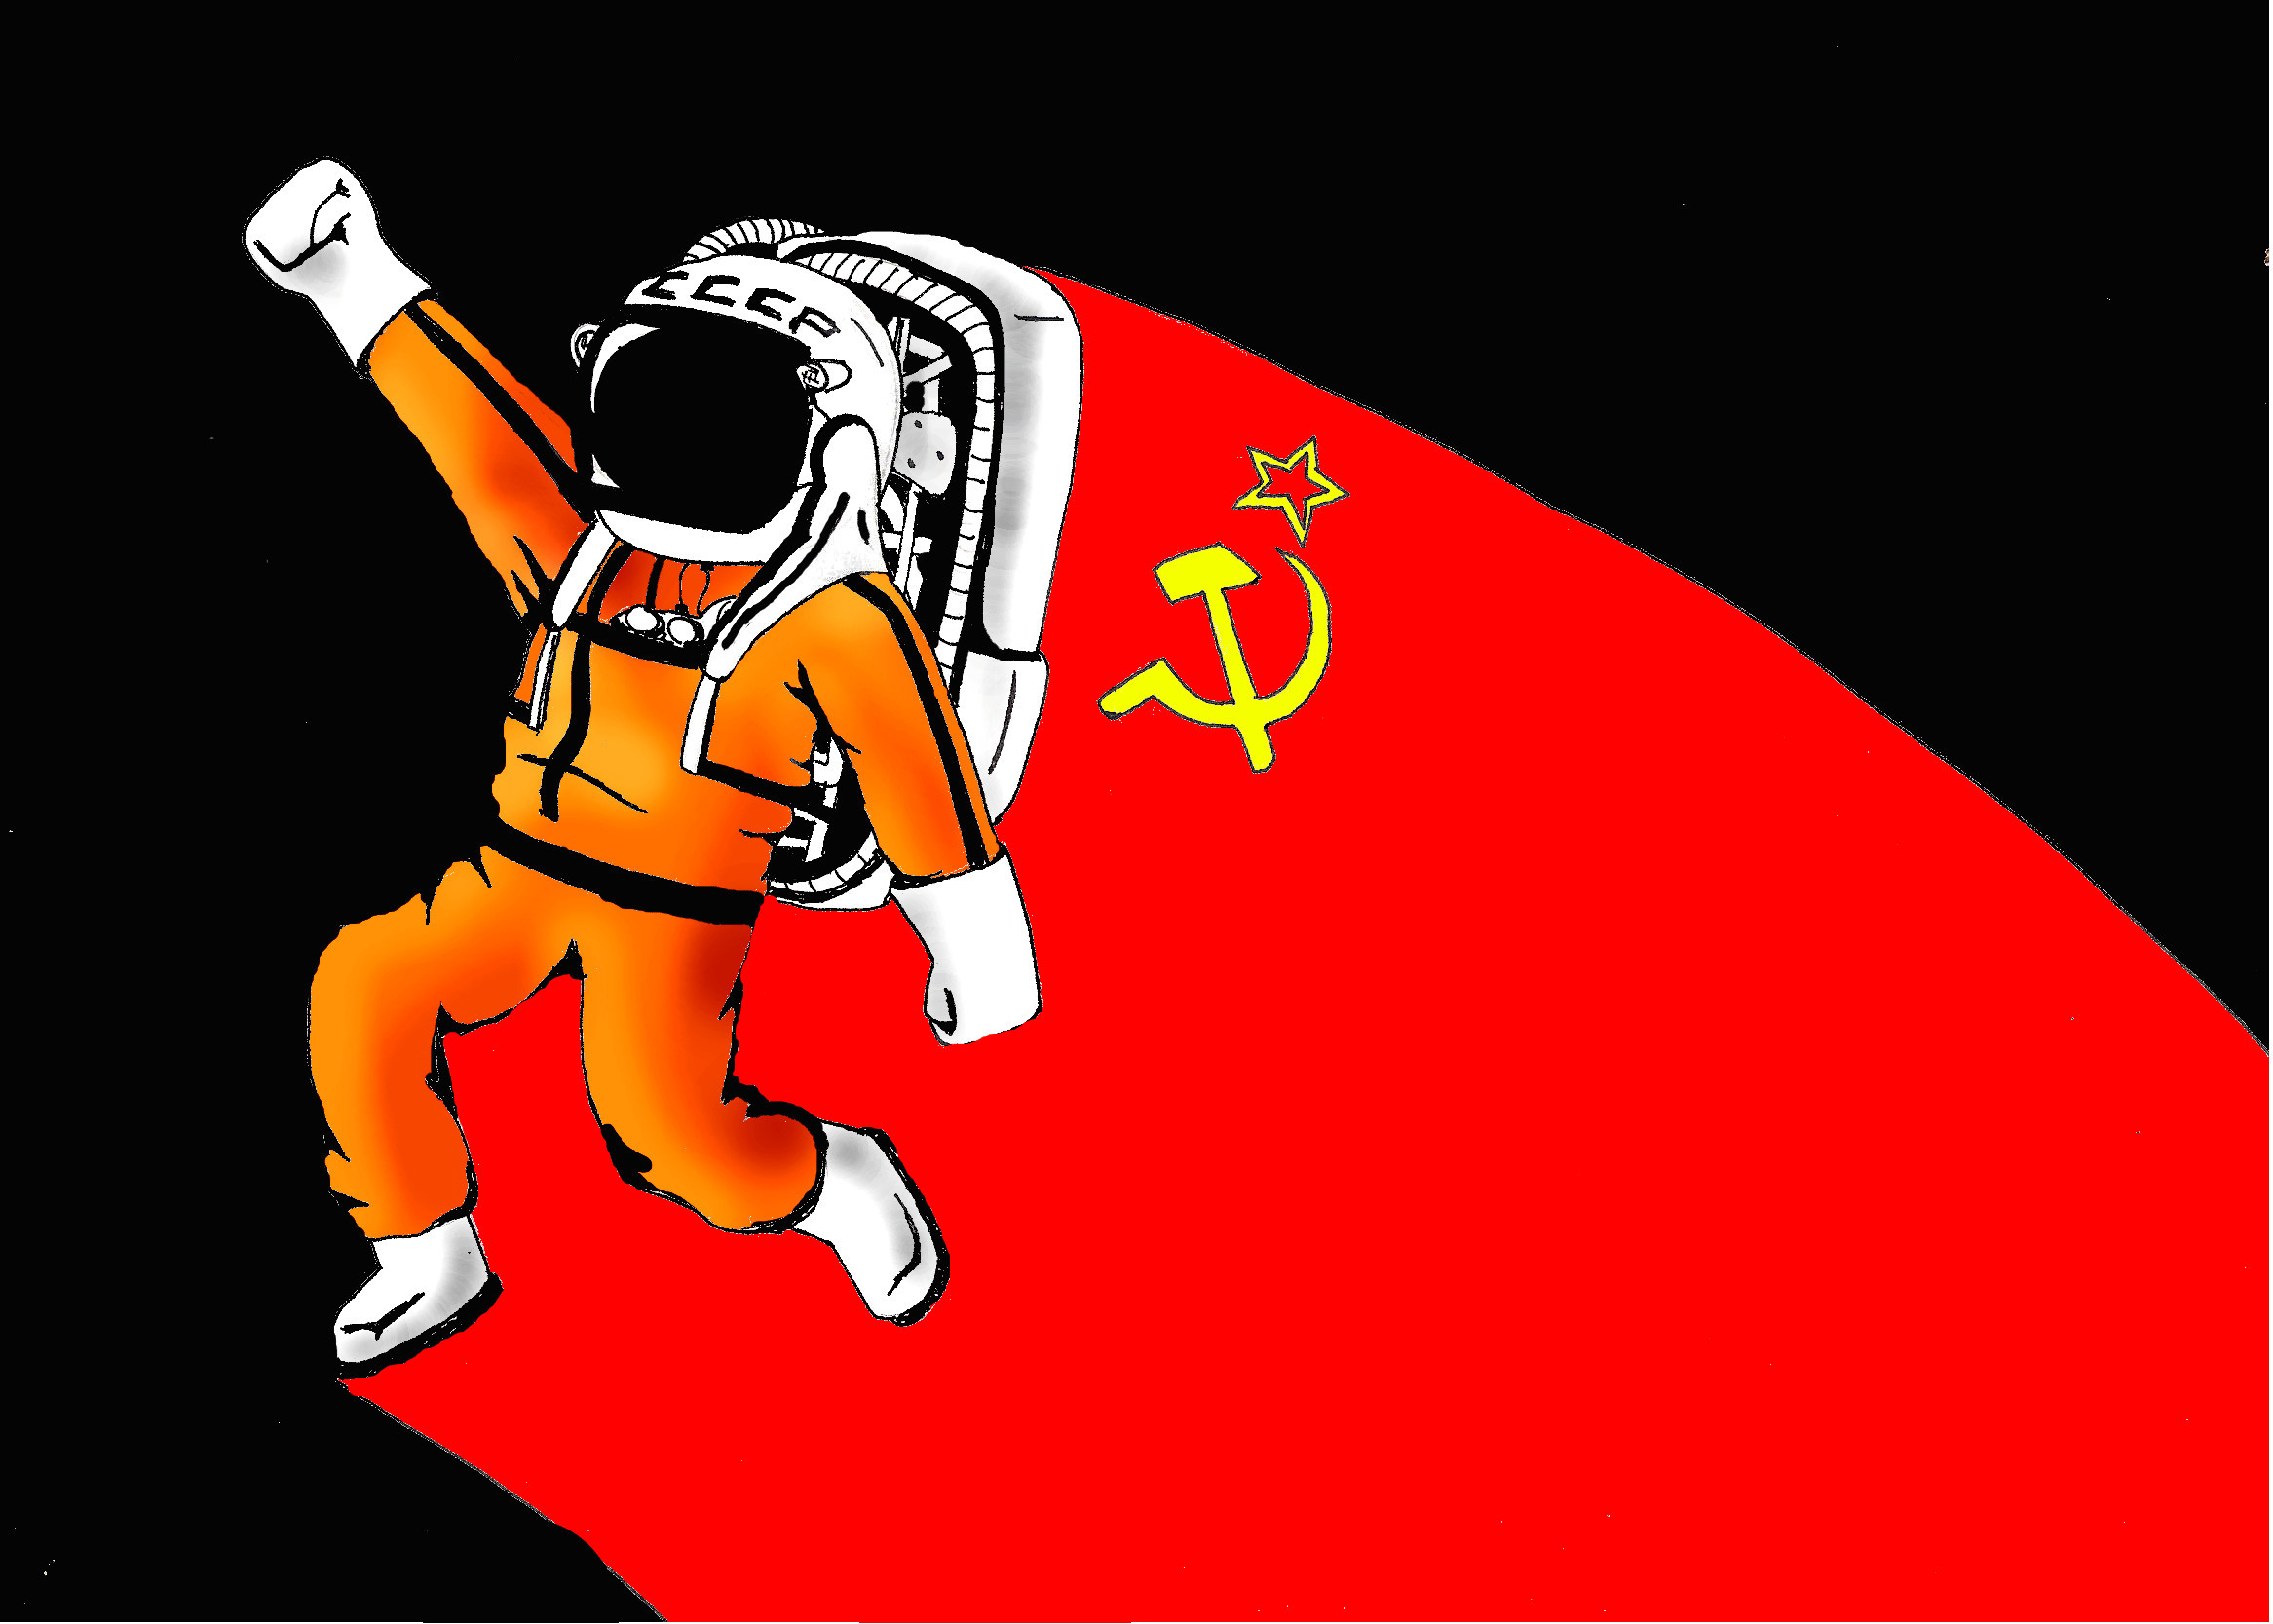 Yuri Gagarin by kobalto1 Yuri Gagarin by kobalto1